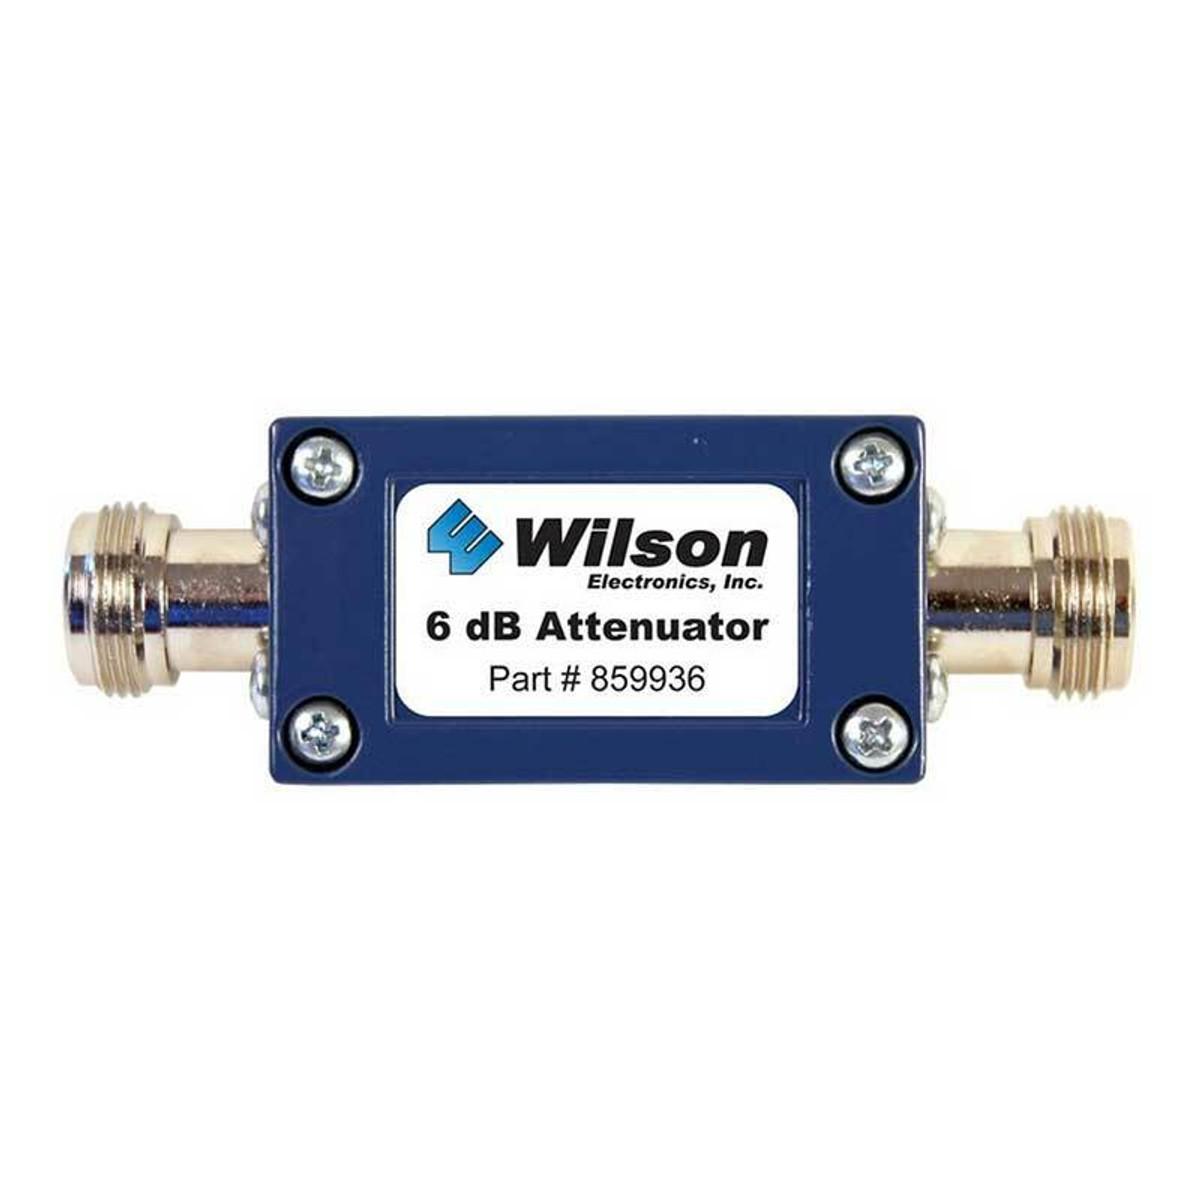 weBoost (Wilson) -6dB Attenuator w/ N-Female | 50 Ohm - 859936